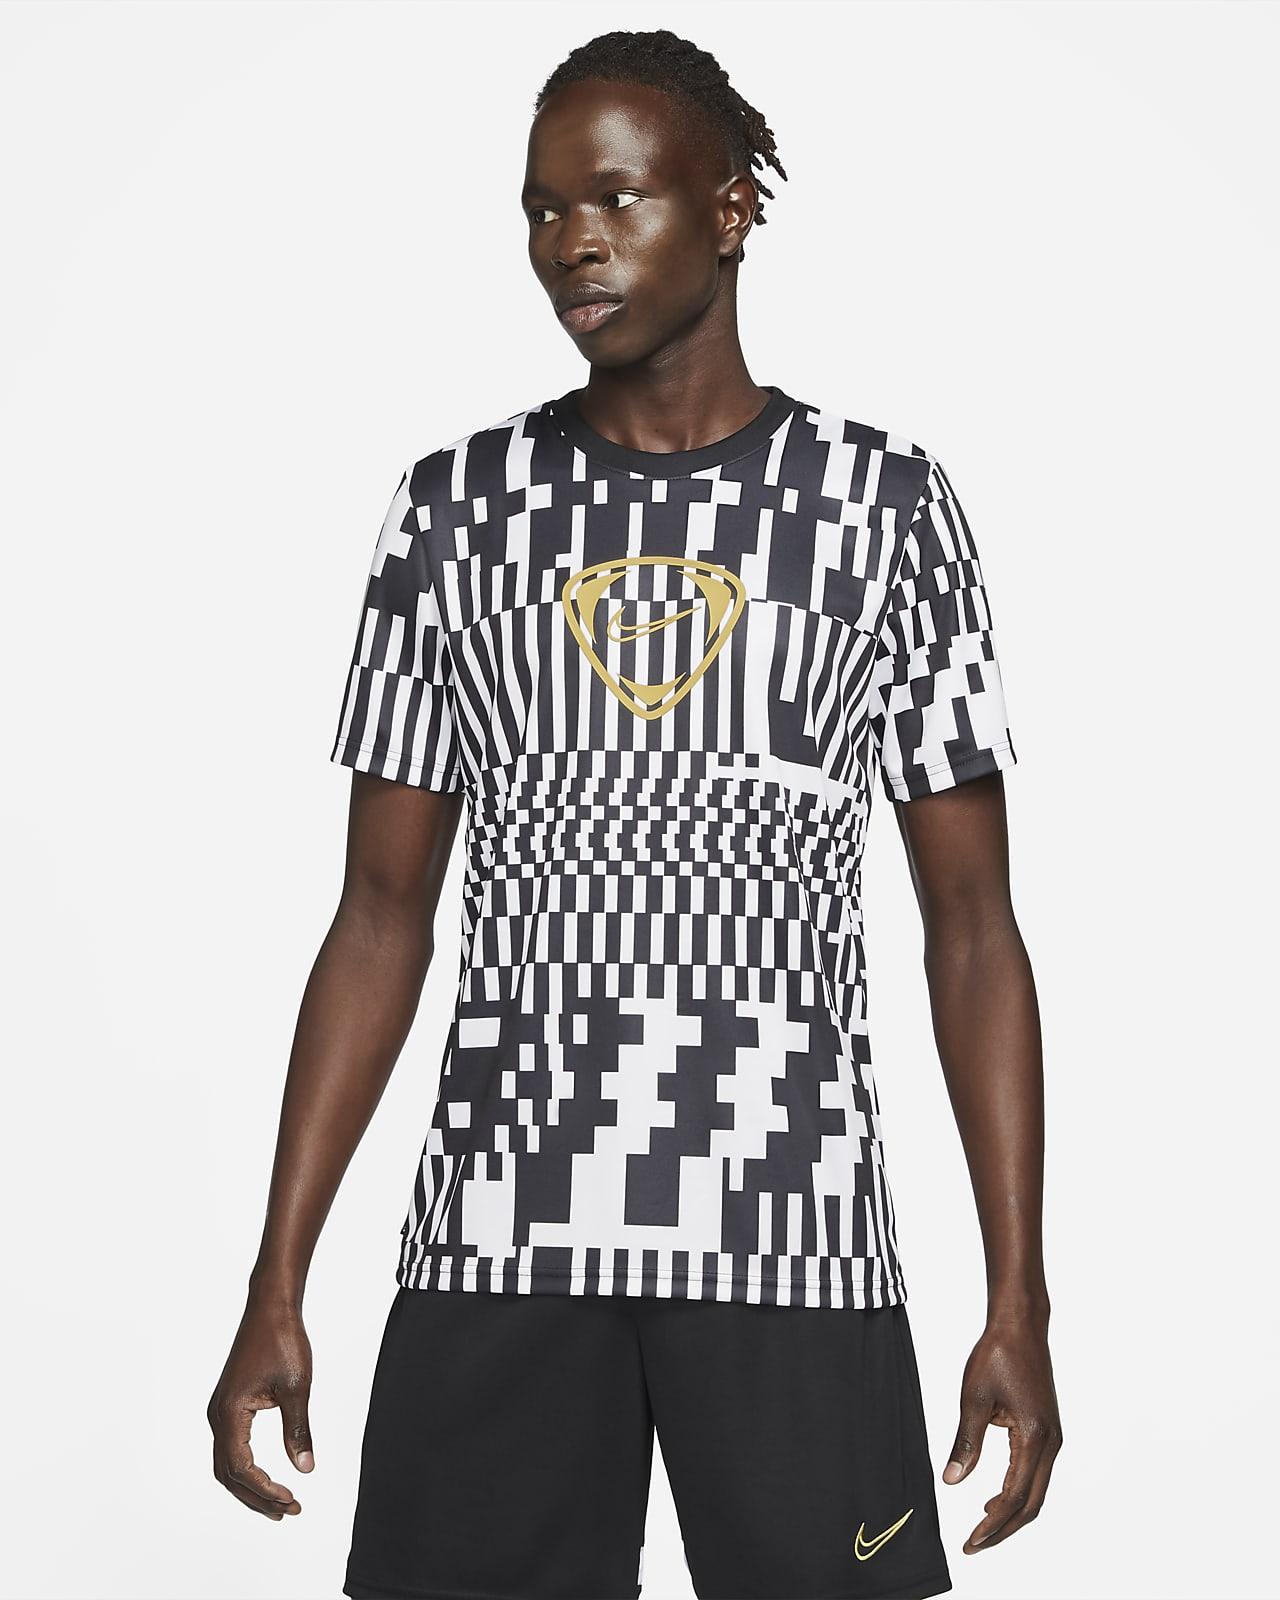 Playera de fútbol para hombre Nike Dri-FIT Academy